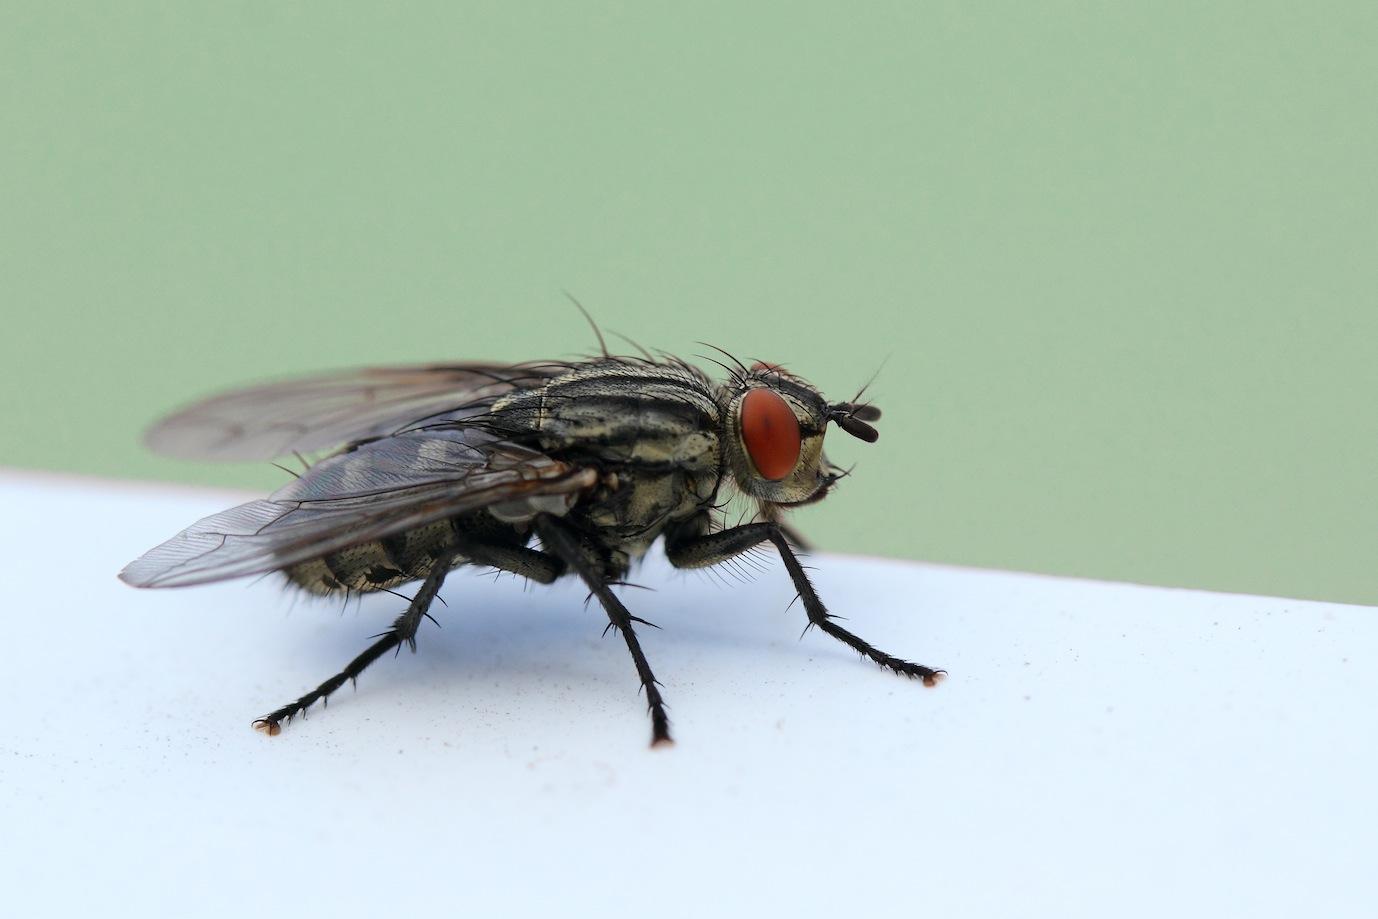 gro e stubenfliege foto bild tiere wildlife insekten. Black Bedroom Furniture Sets. Home Design Ideas